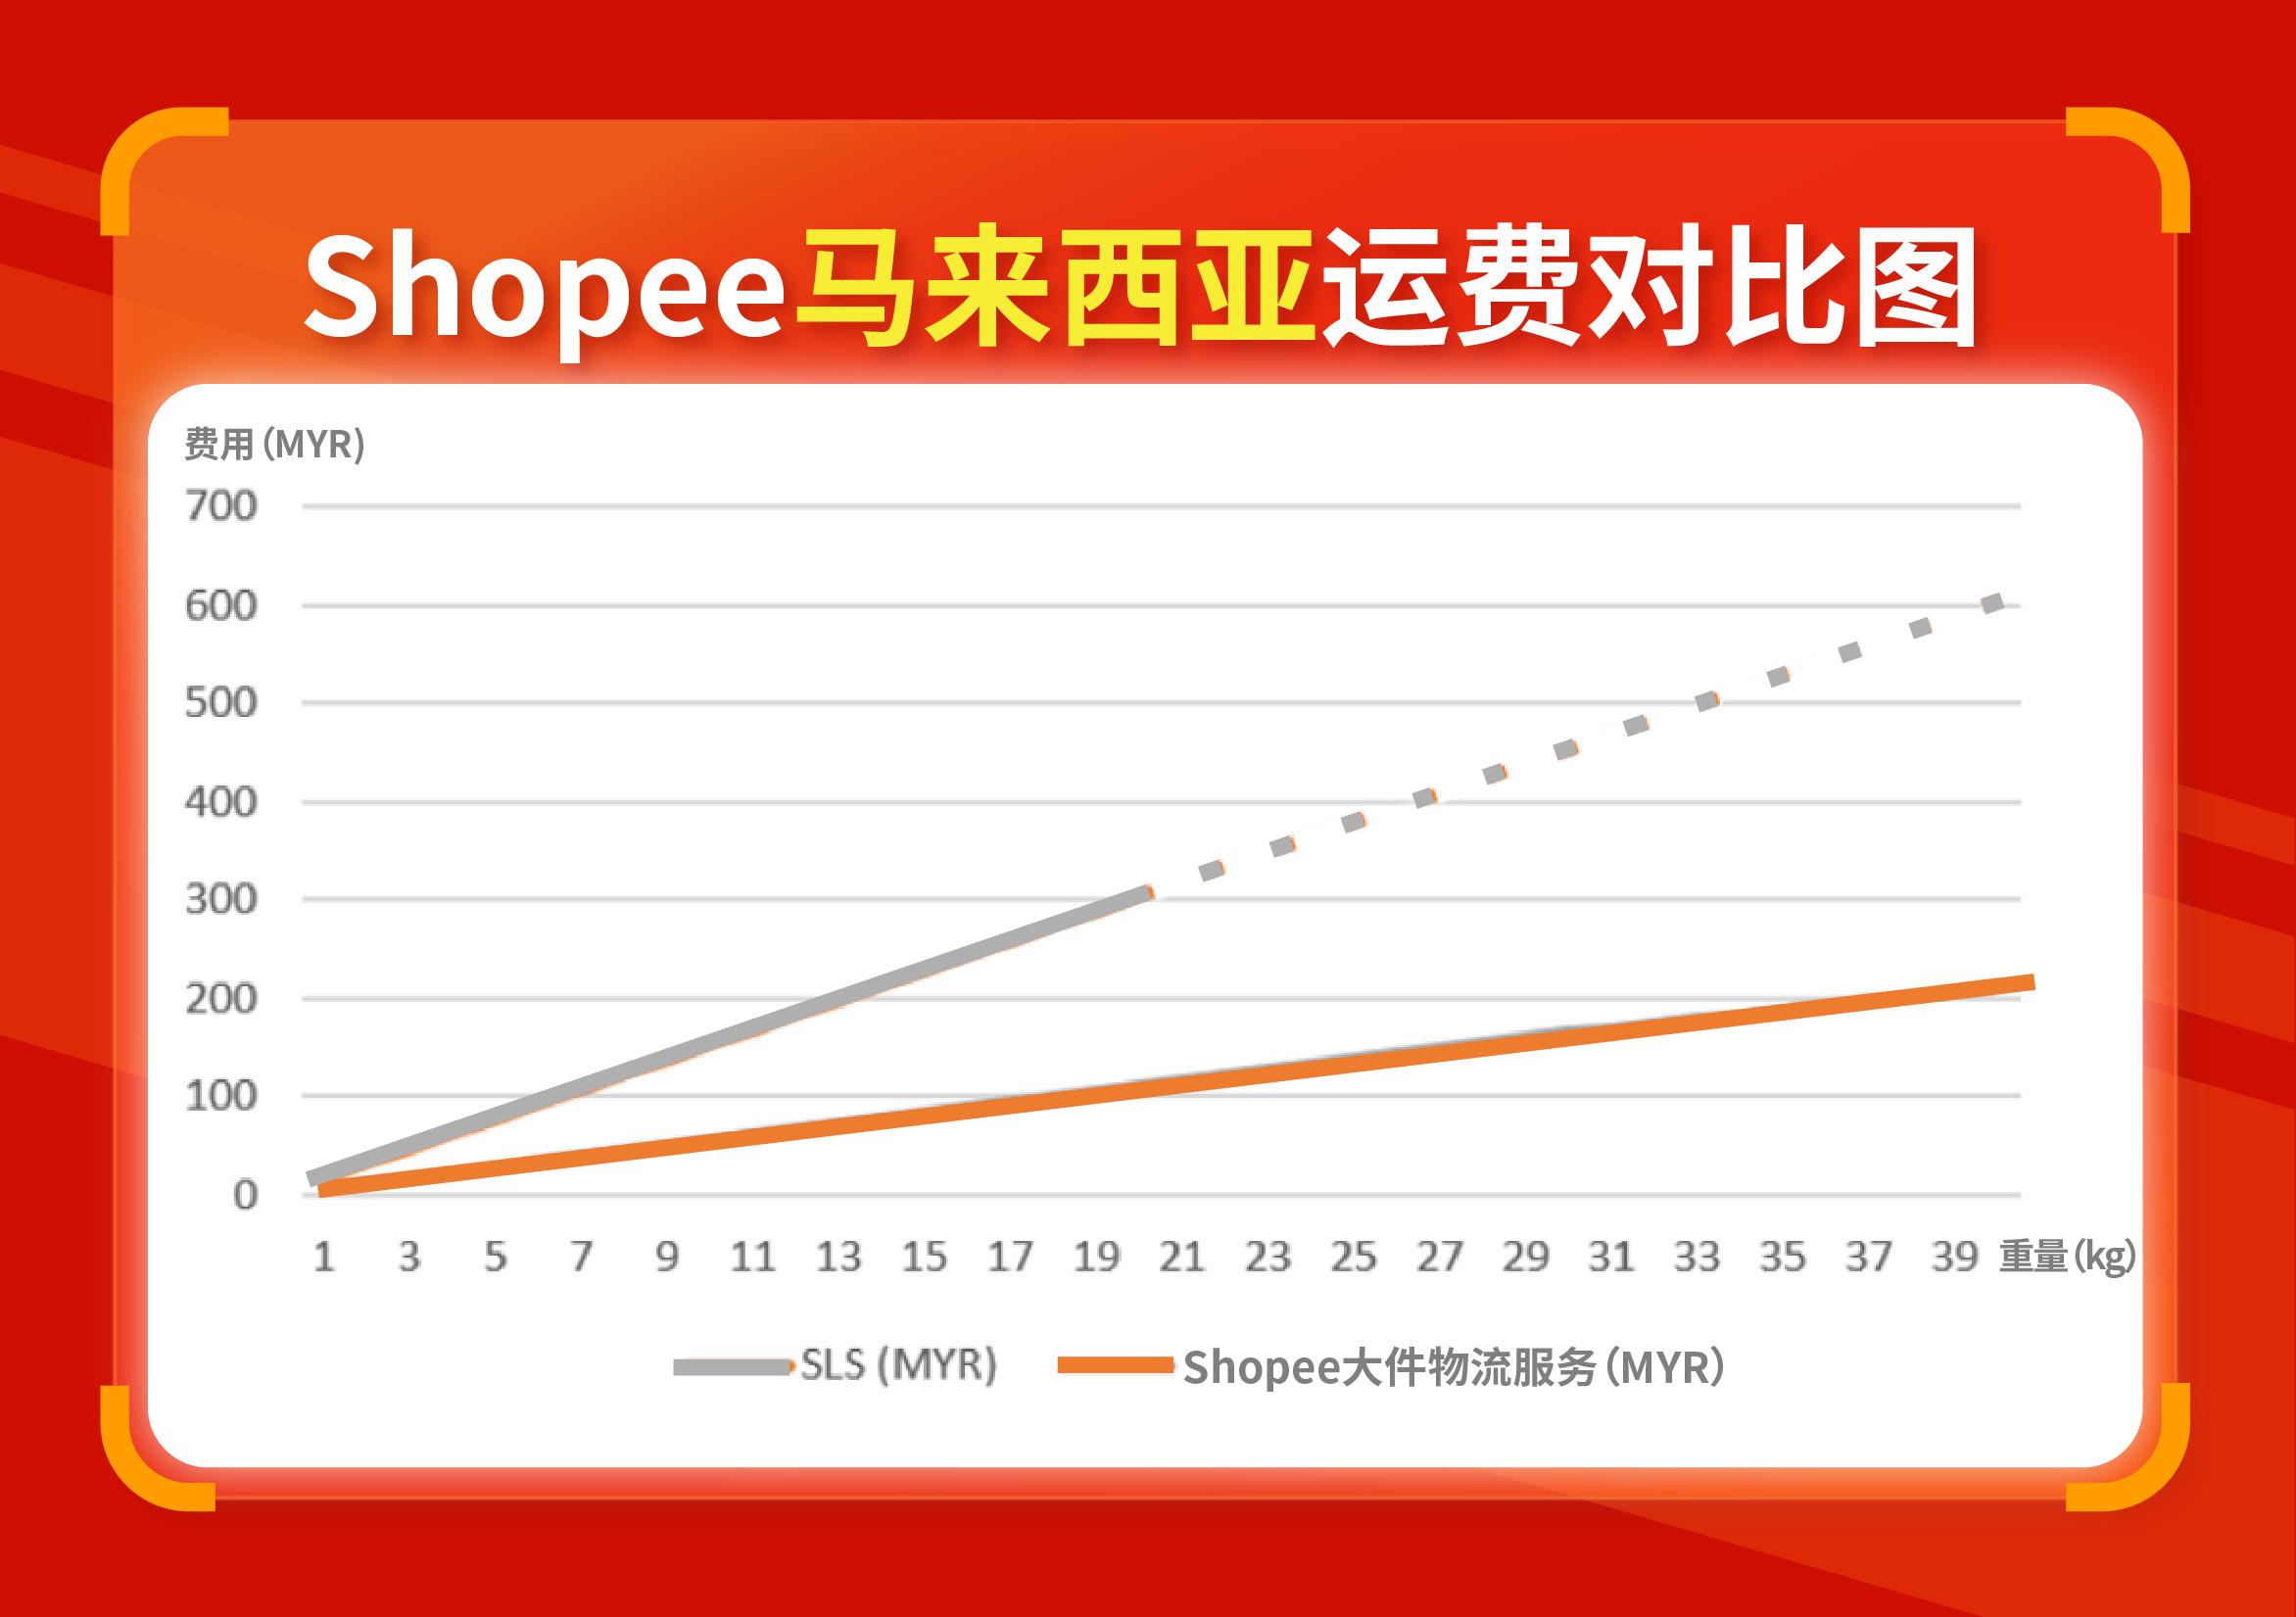 Shopee大件物流服务运费对比.jpg